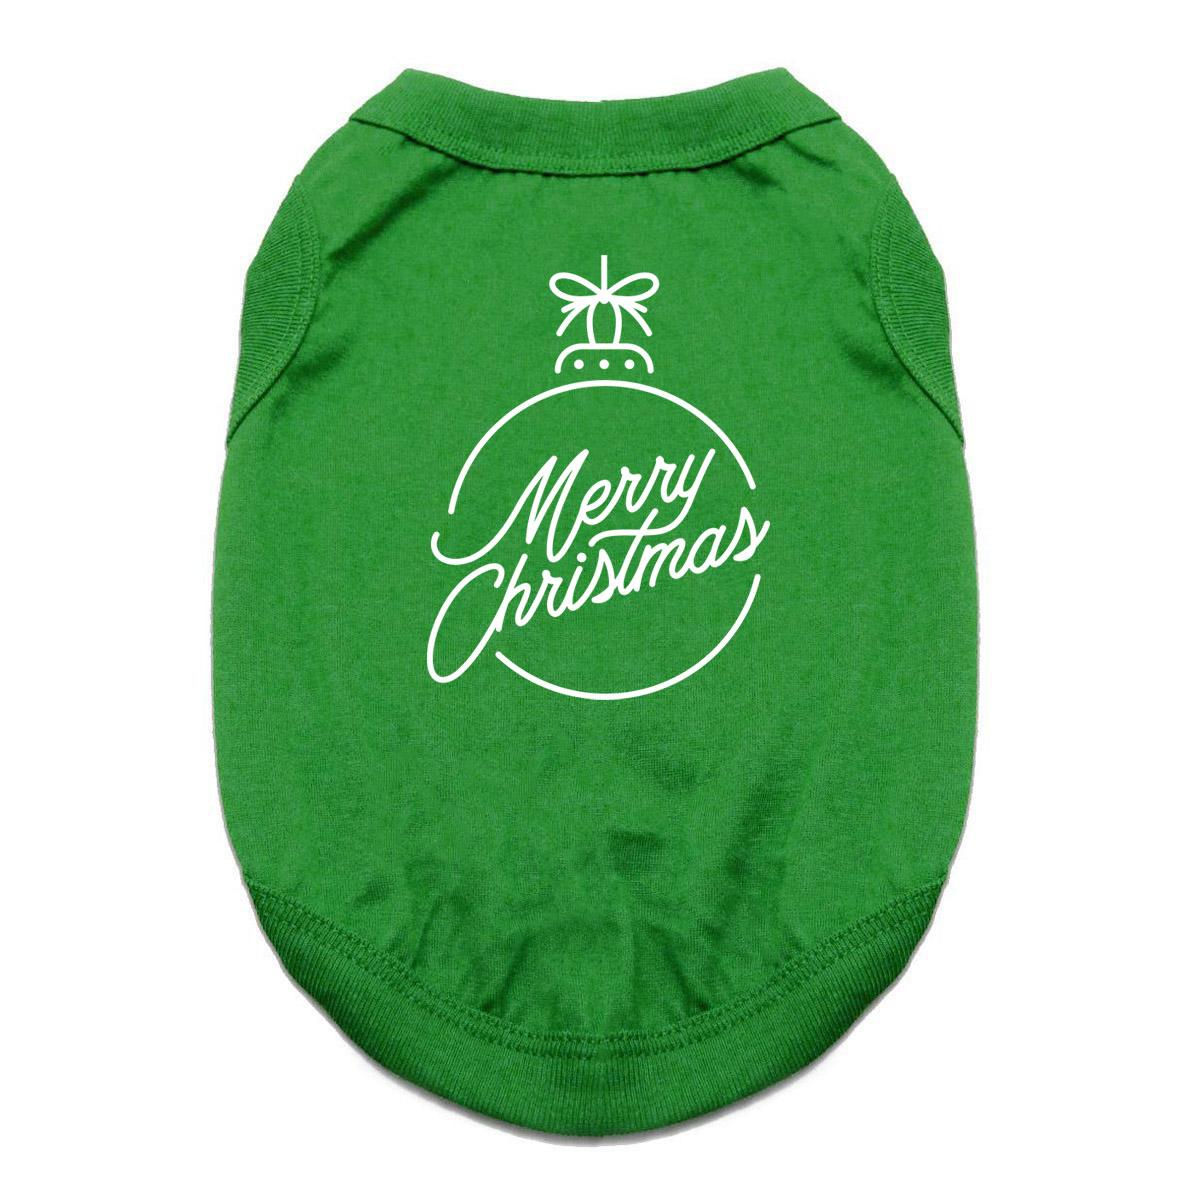 Merry Christmas Ornament Dog Shirt - Green